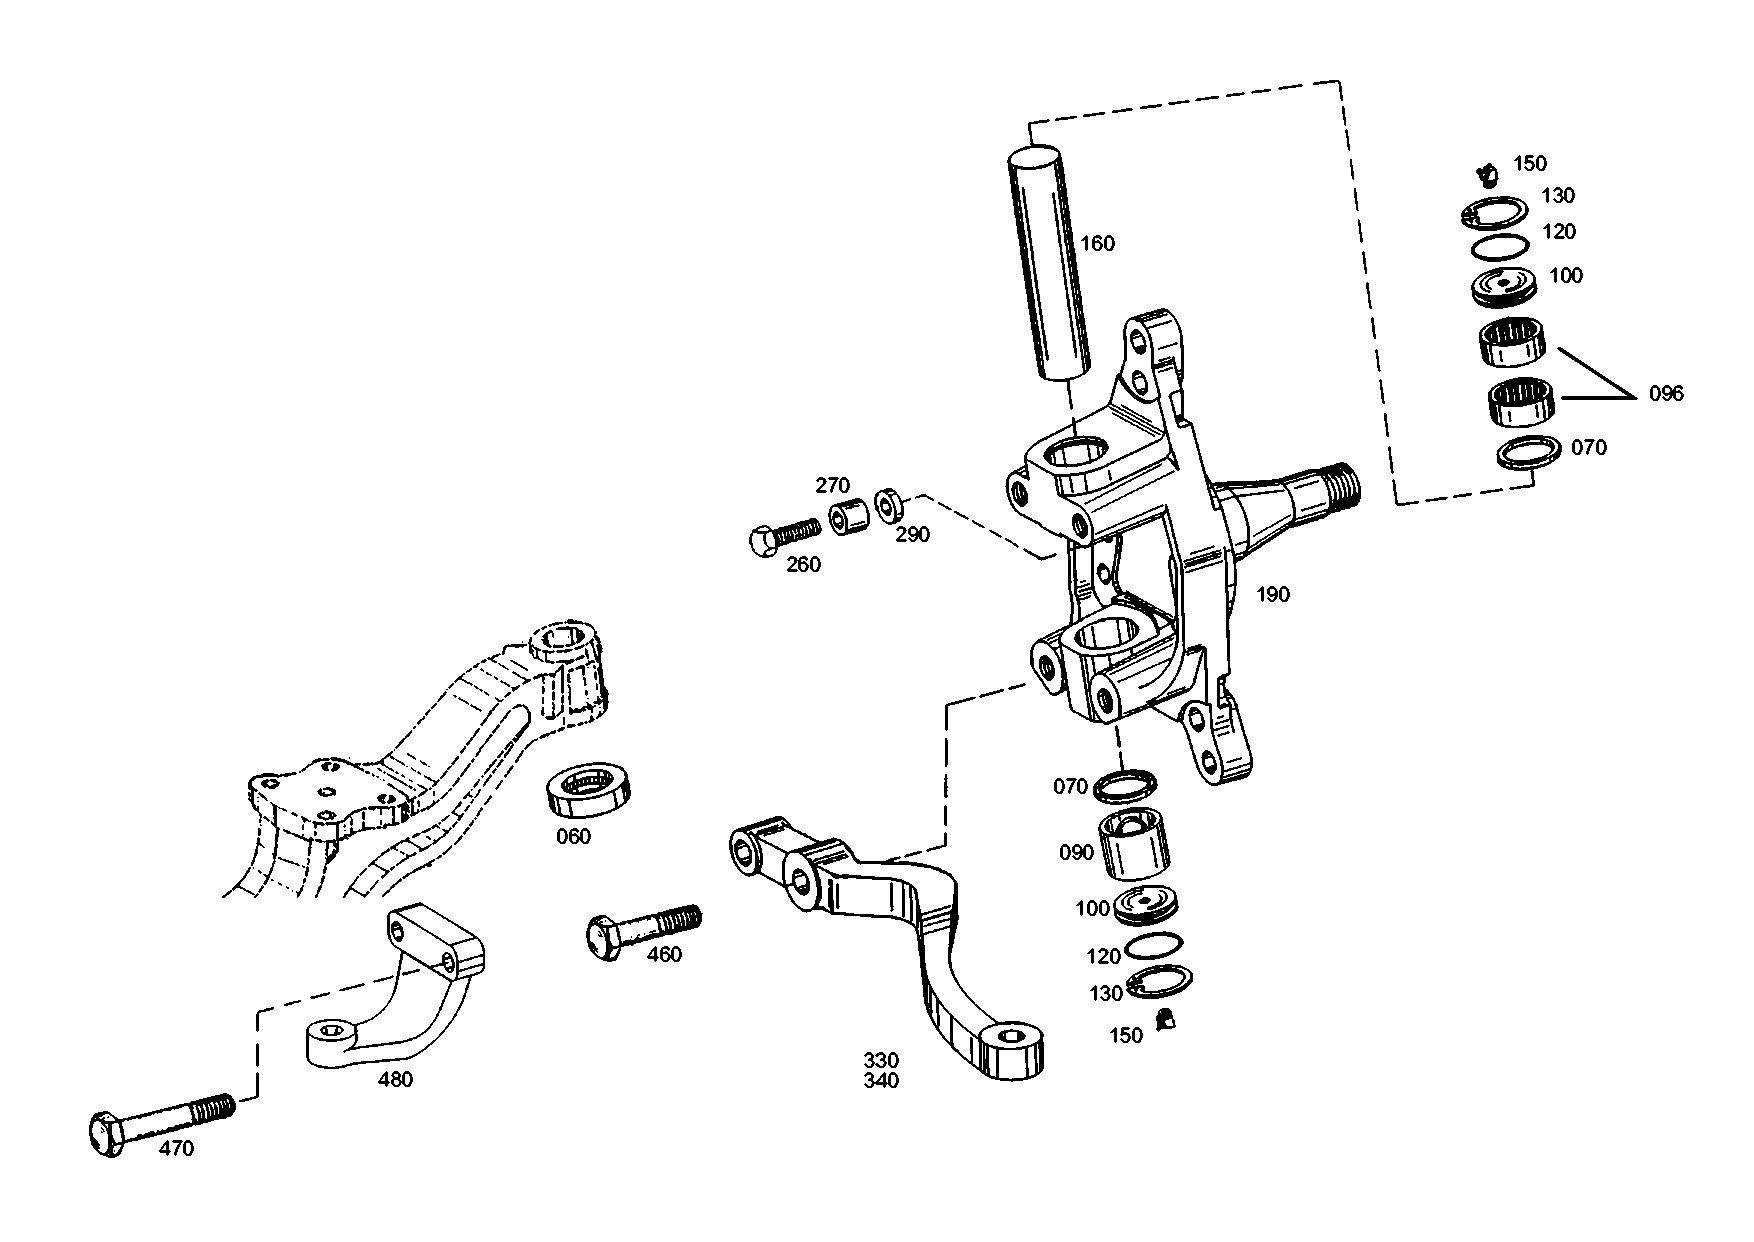 hight resolution of item 90 on diagram